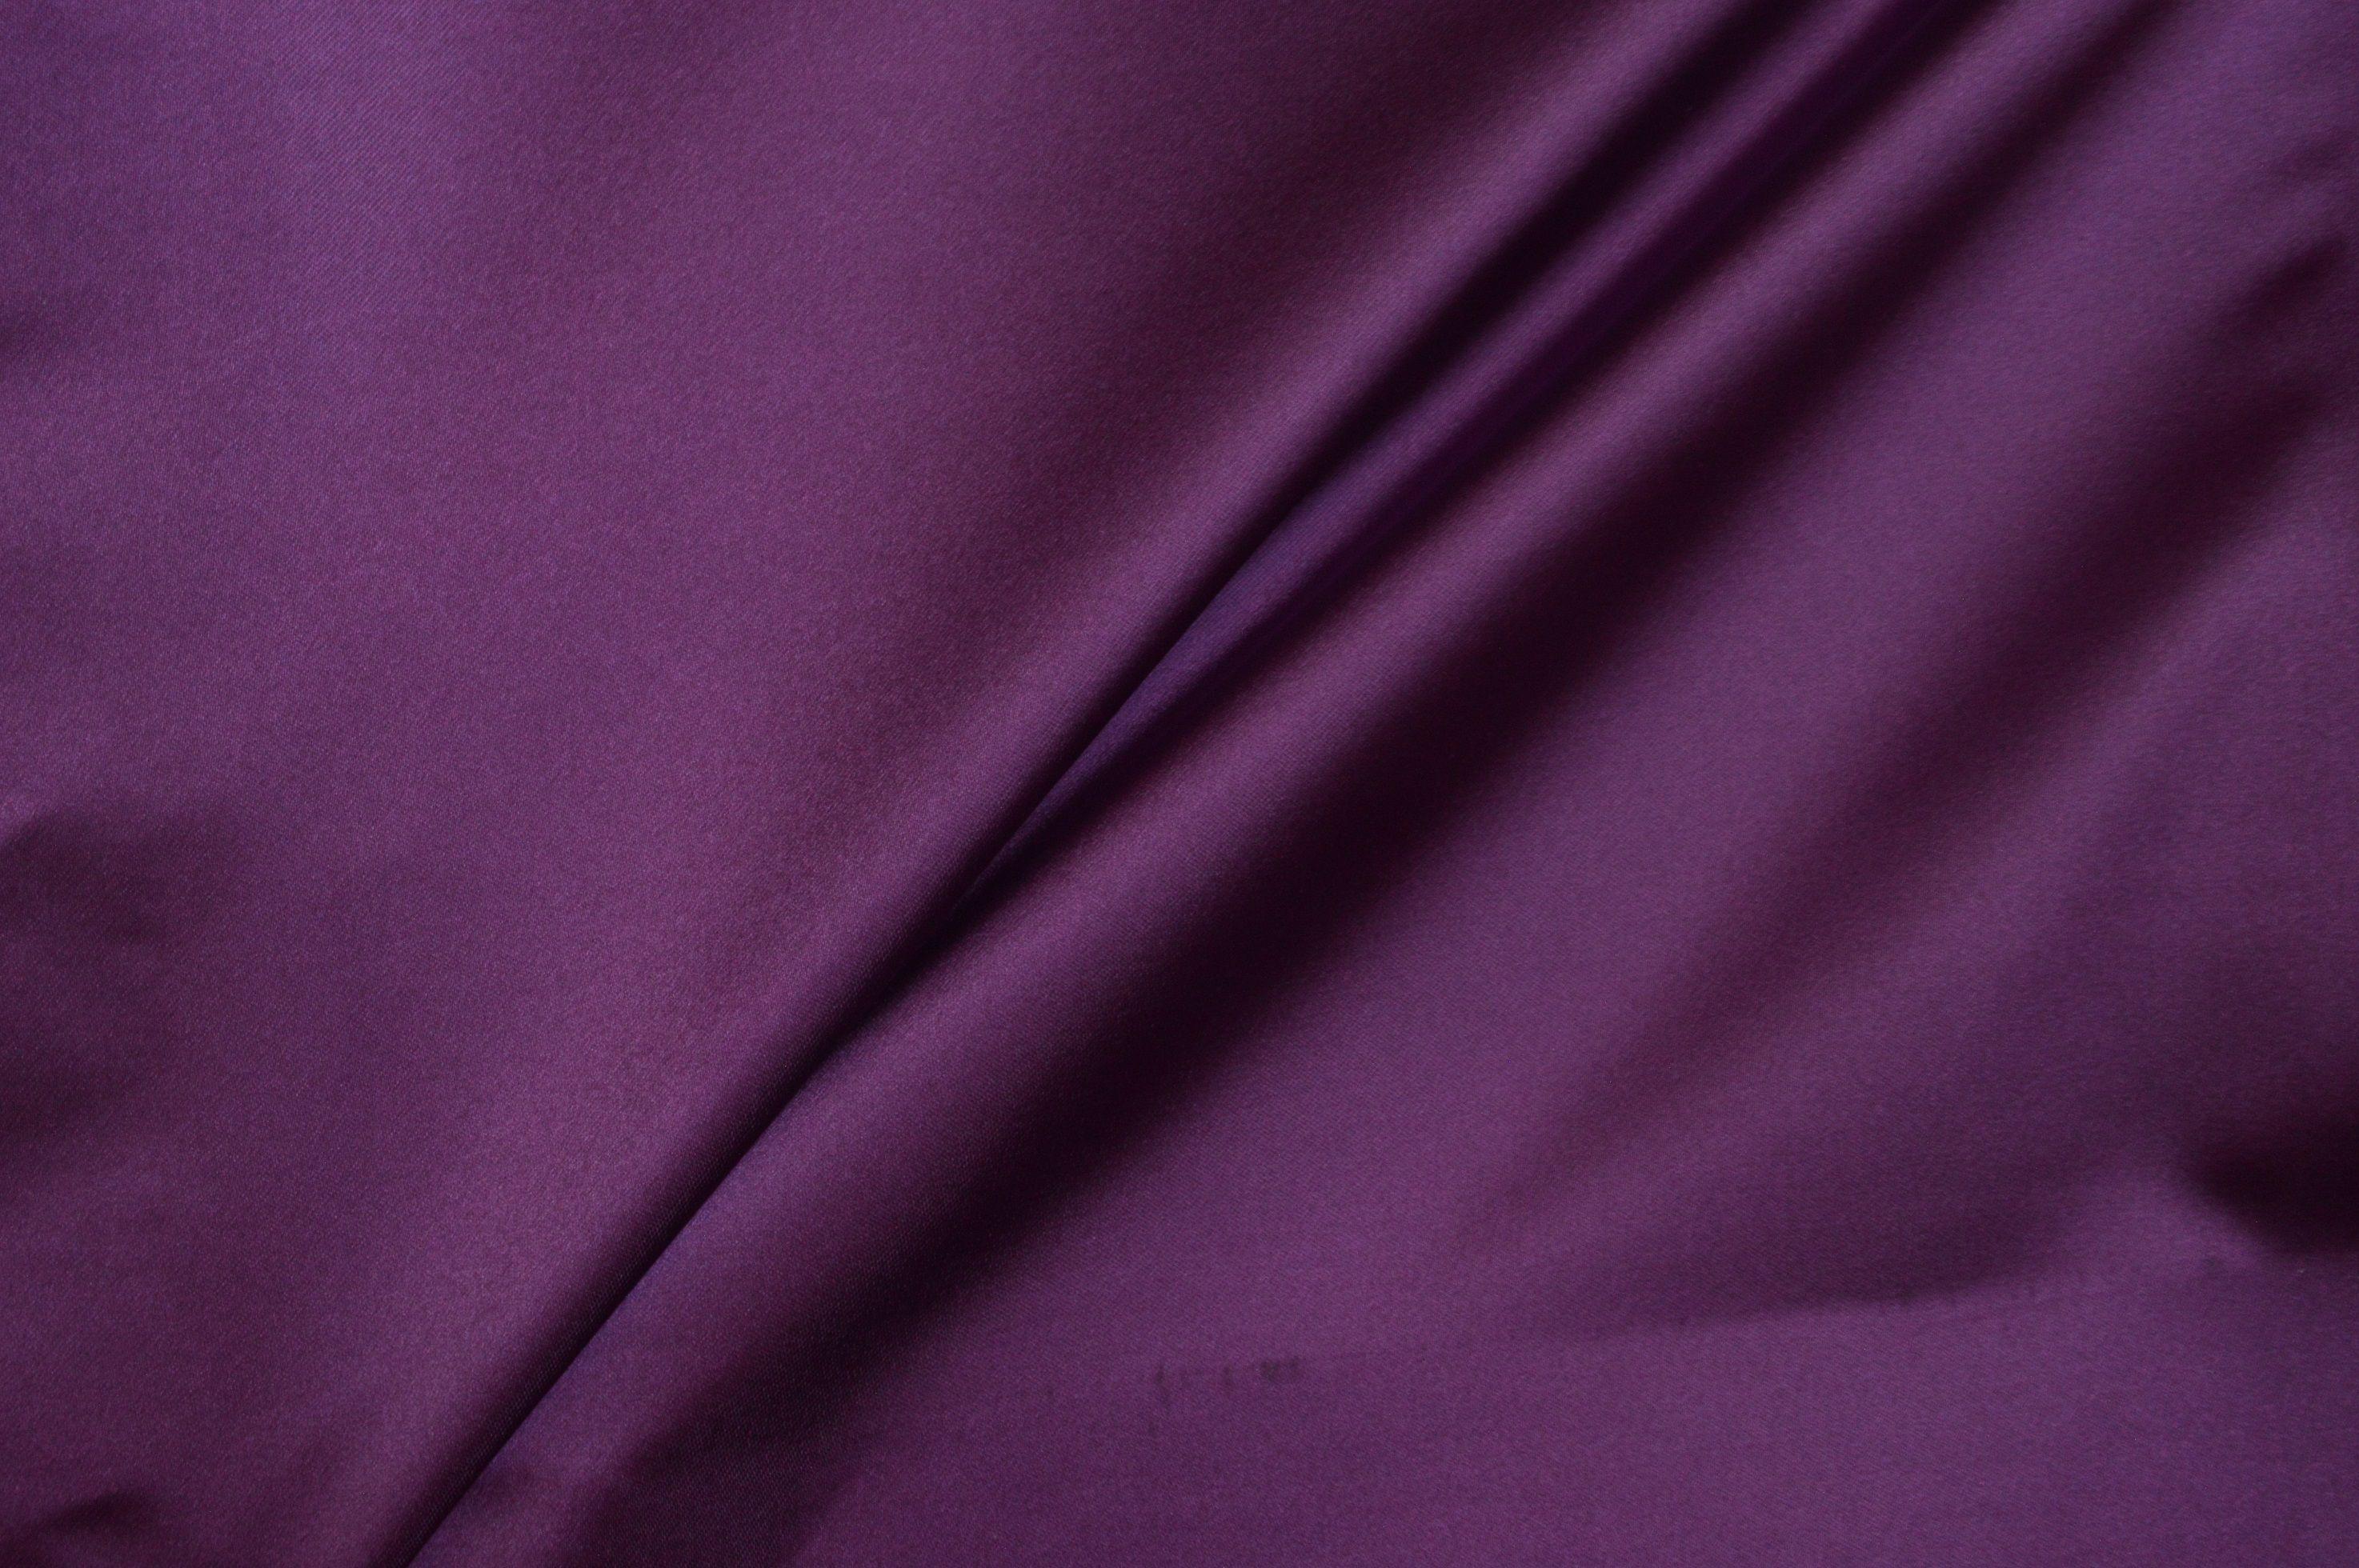 silky plain purple curtain fabric